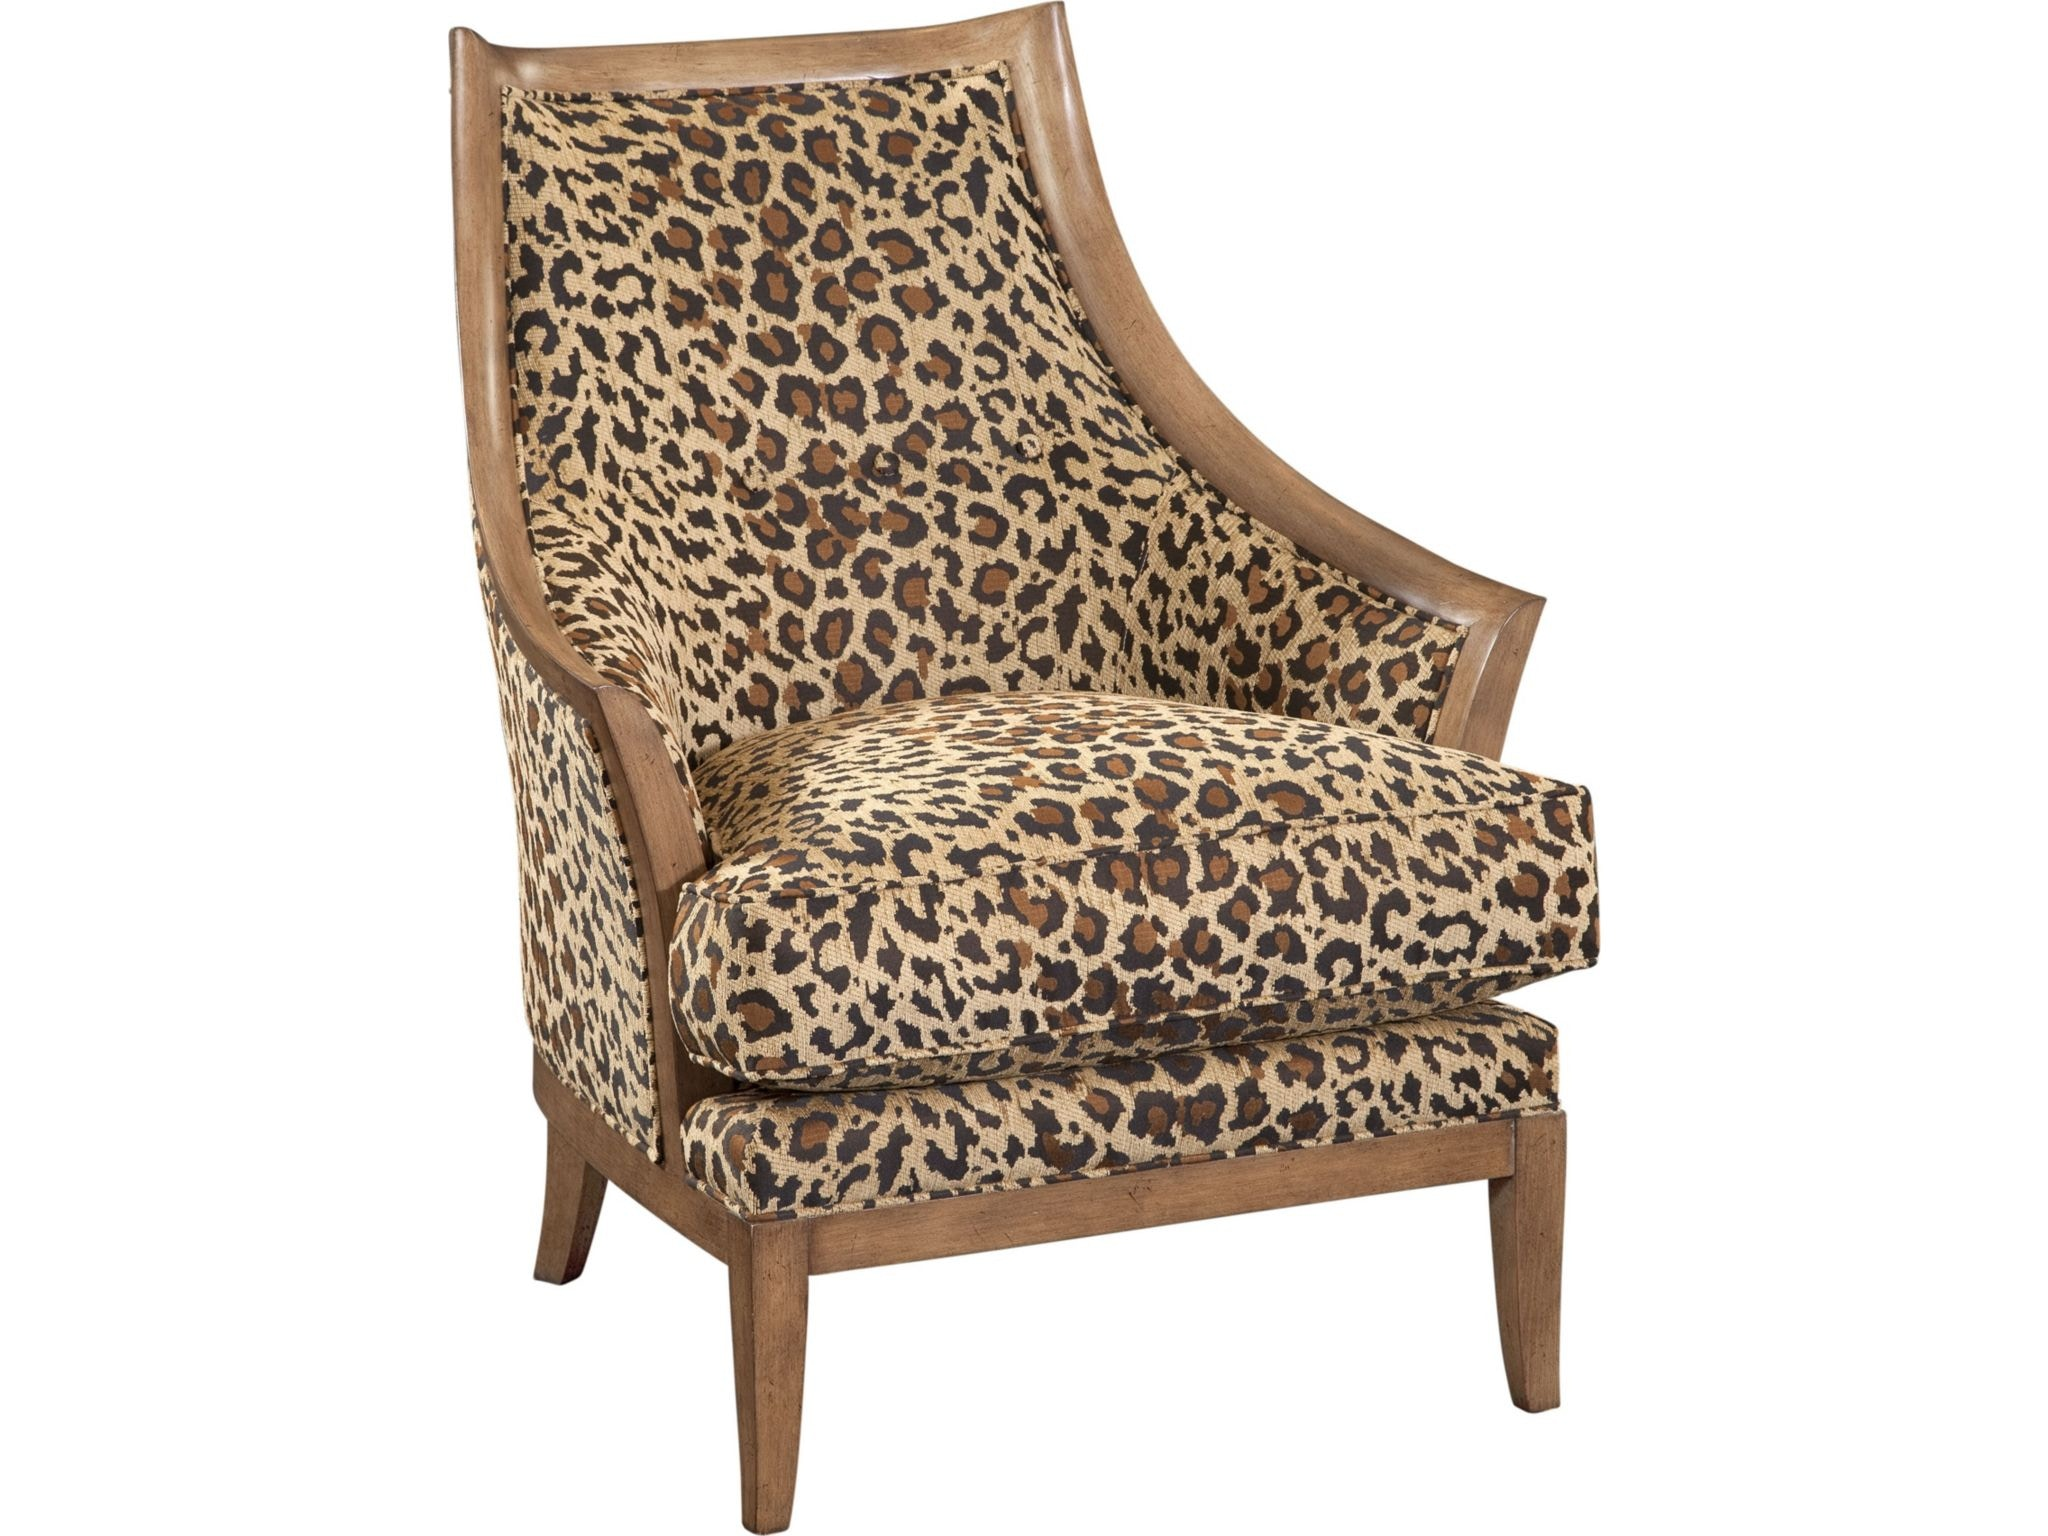 Thomasville Madrid Chair 1580 15